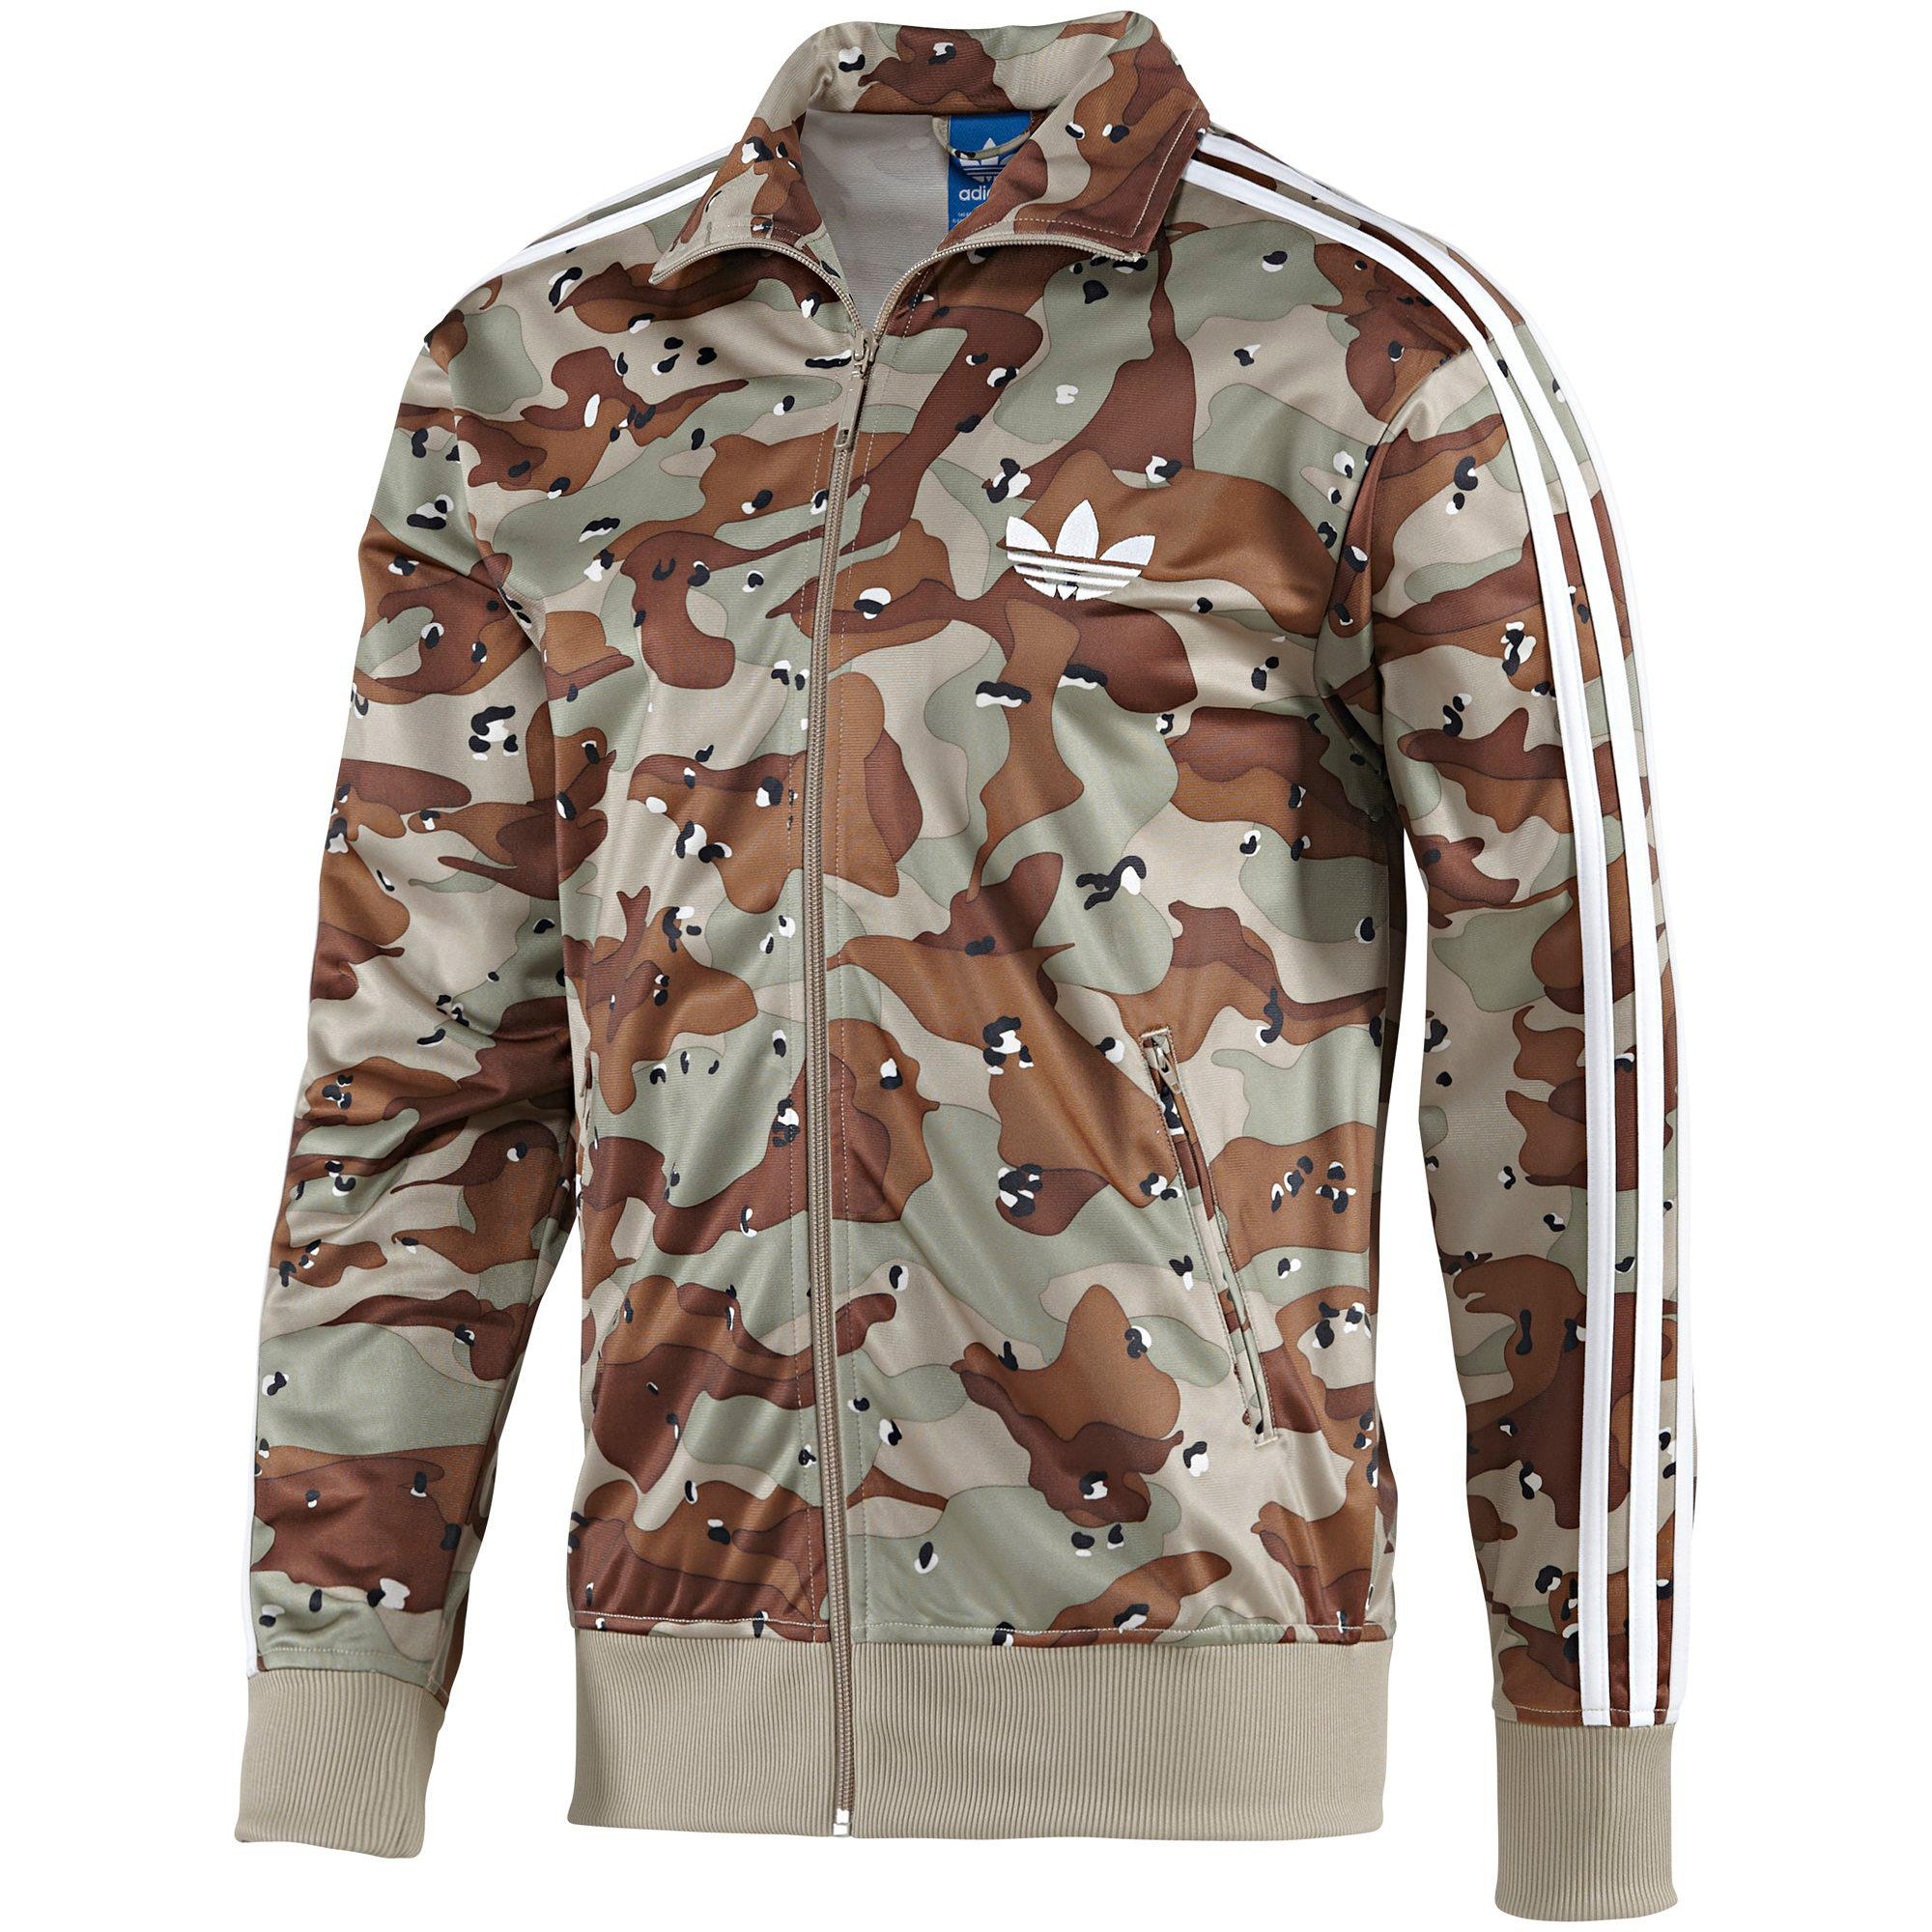 Foto adidas chaqueta de chándal Beckenbauer Hombre foto 75628